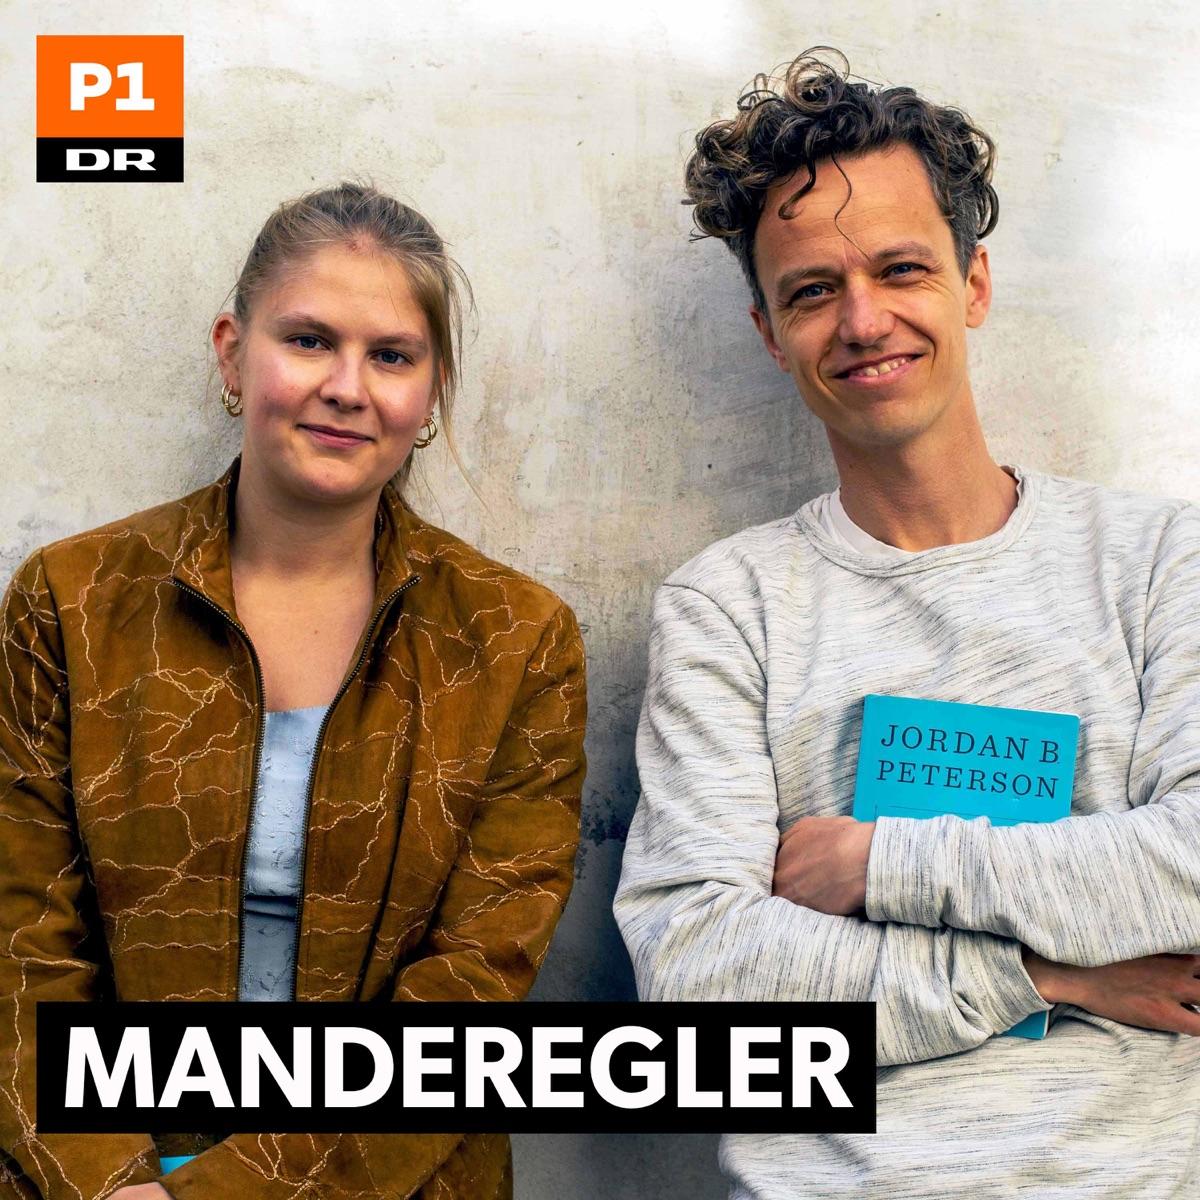 Manderegler - med Emma Holten og Anders Haahr 2:5 2019-07-10